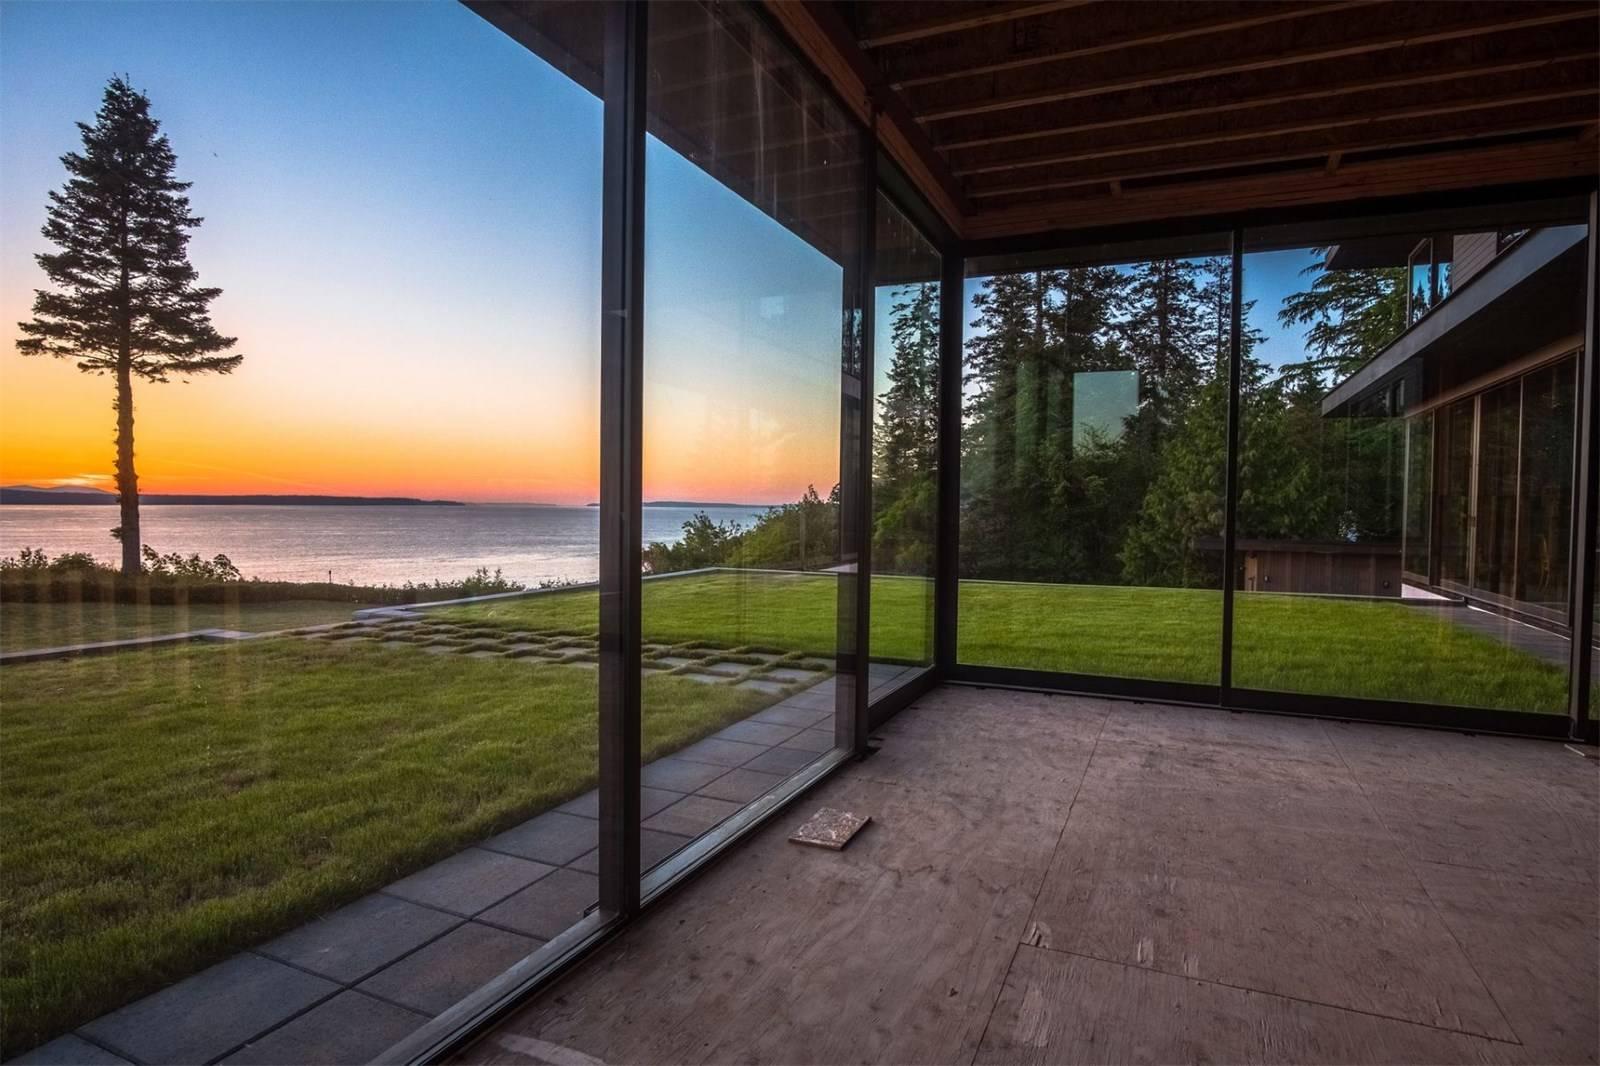 NORTH SEATTLE - Arlington - Darrington - Edmonds - Everett - Gold Bar Granite Falls - Hat Island - Index - Lake Stevens - Lynnwood - Marysville - Monroe - Mukilteo - Snohomish - Stanwood - Sultan - Tulalip - Woodinville - Woodway